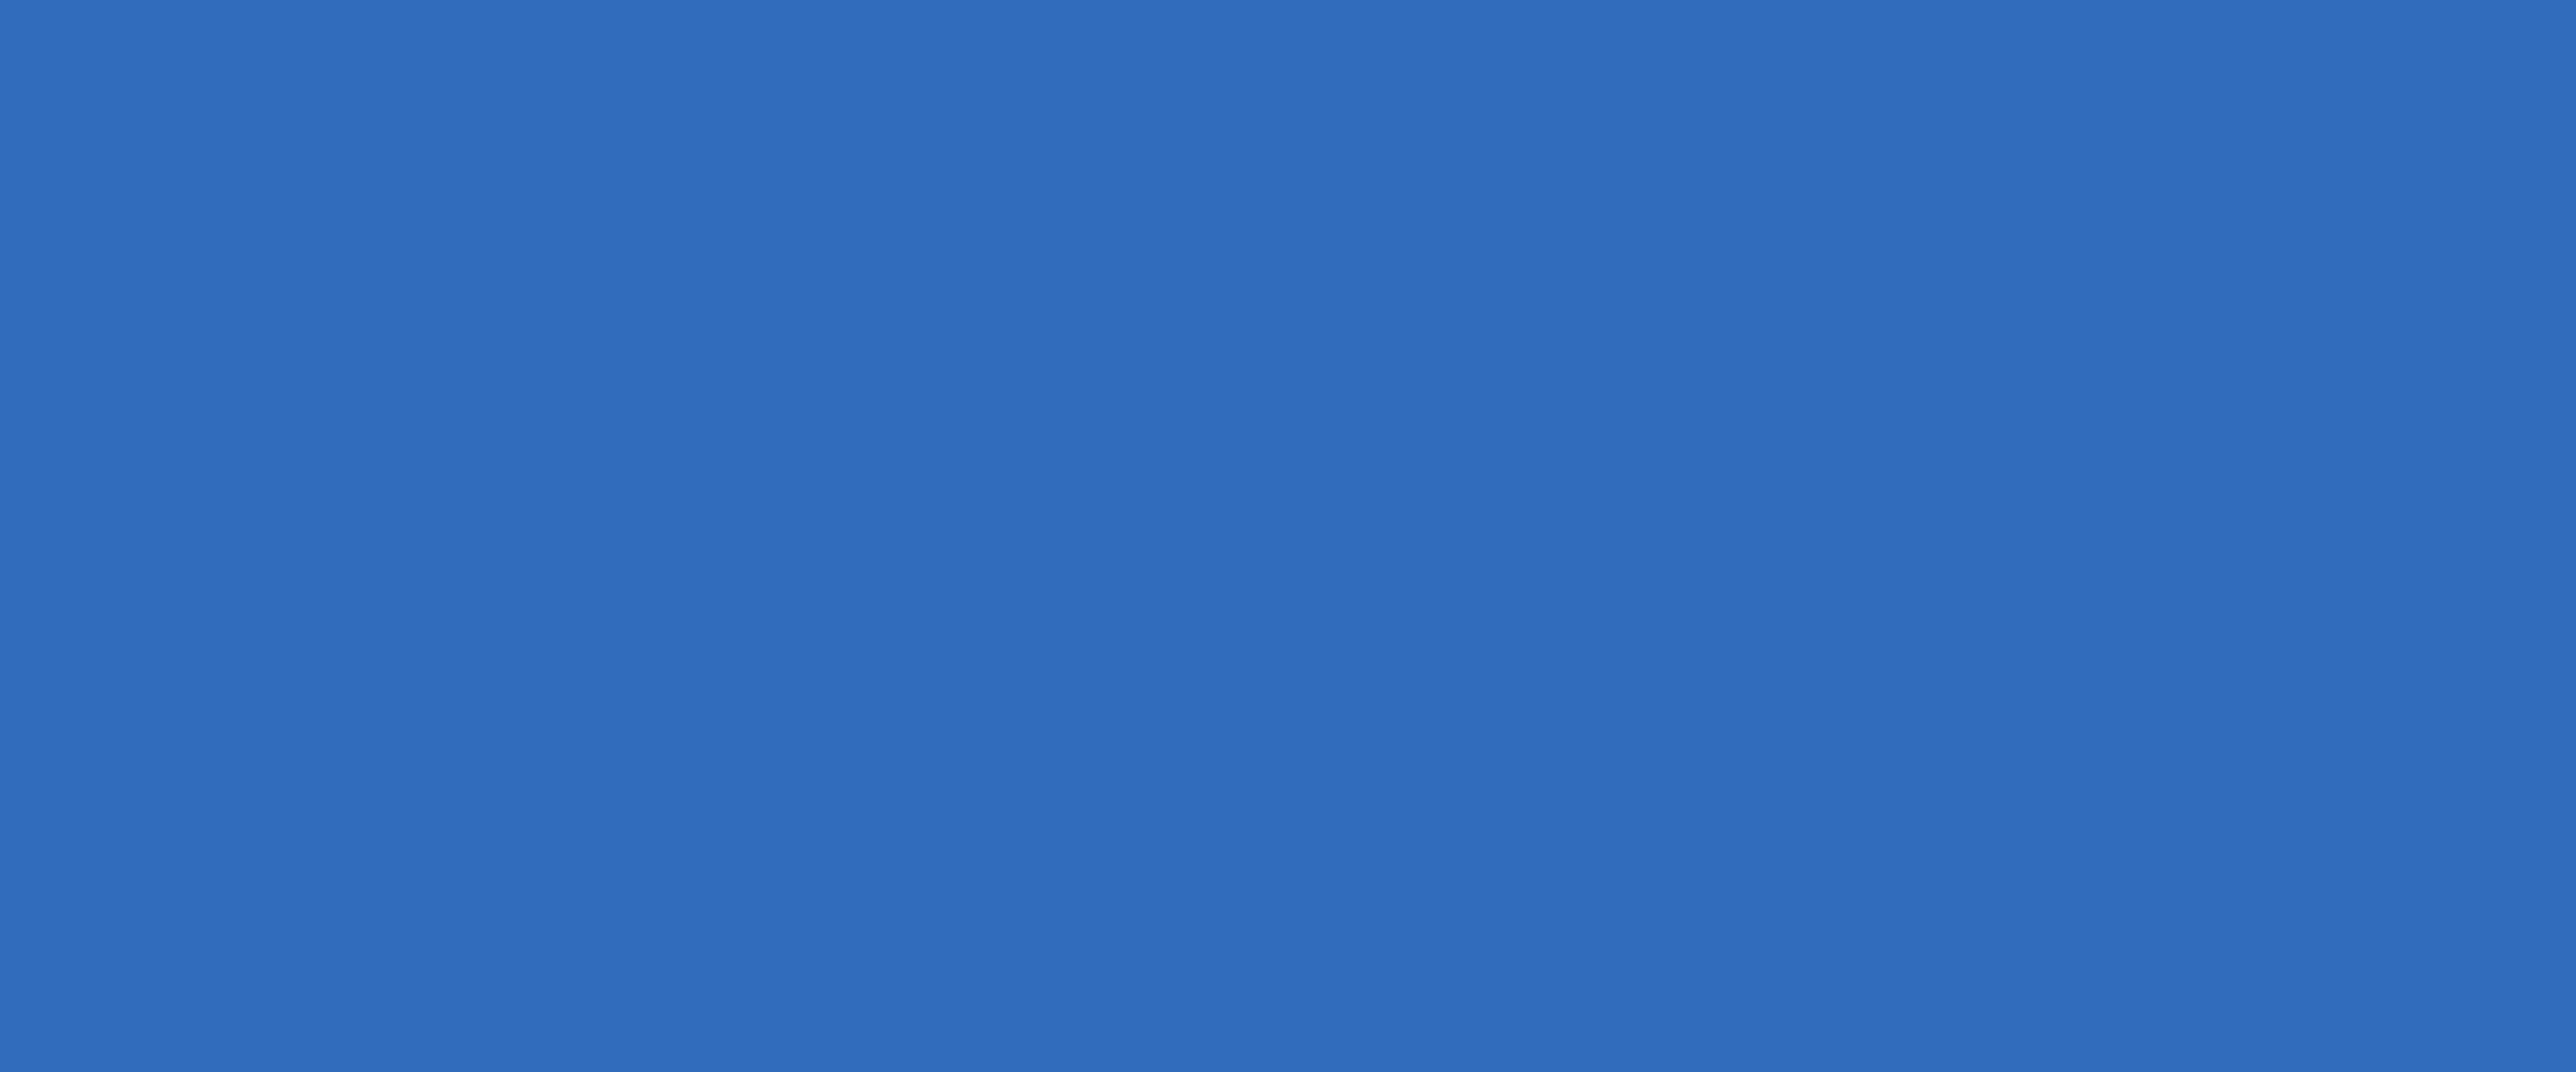 Gradient Blue Bar